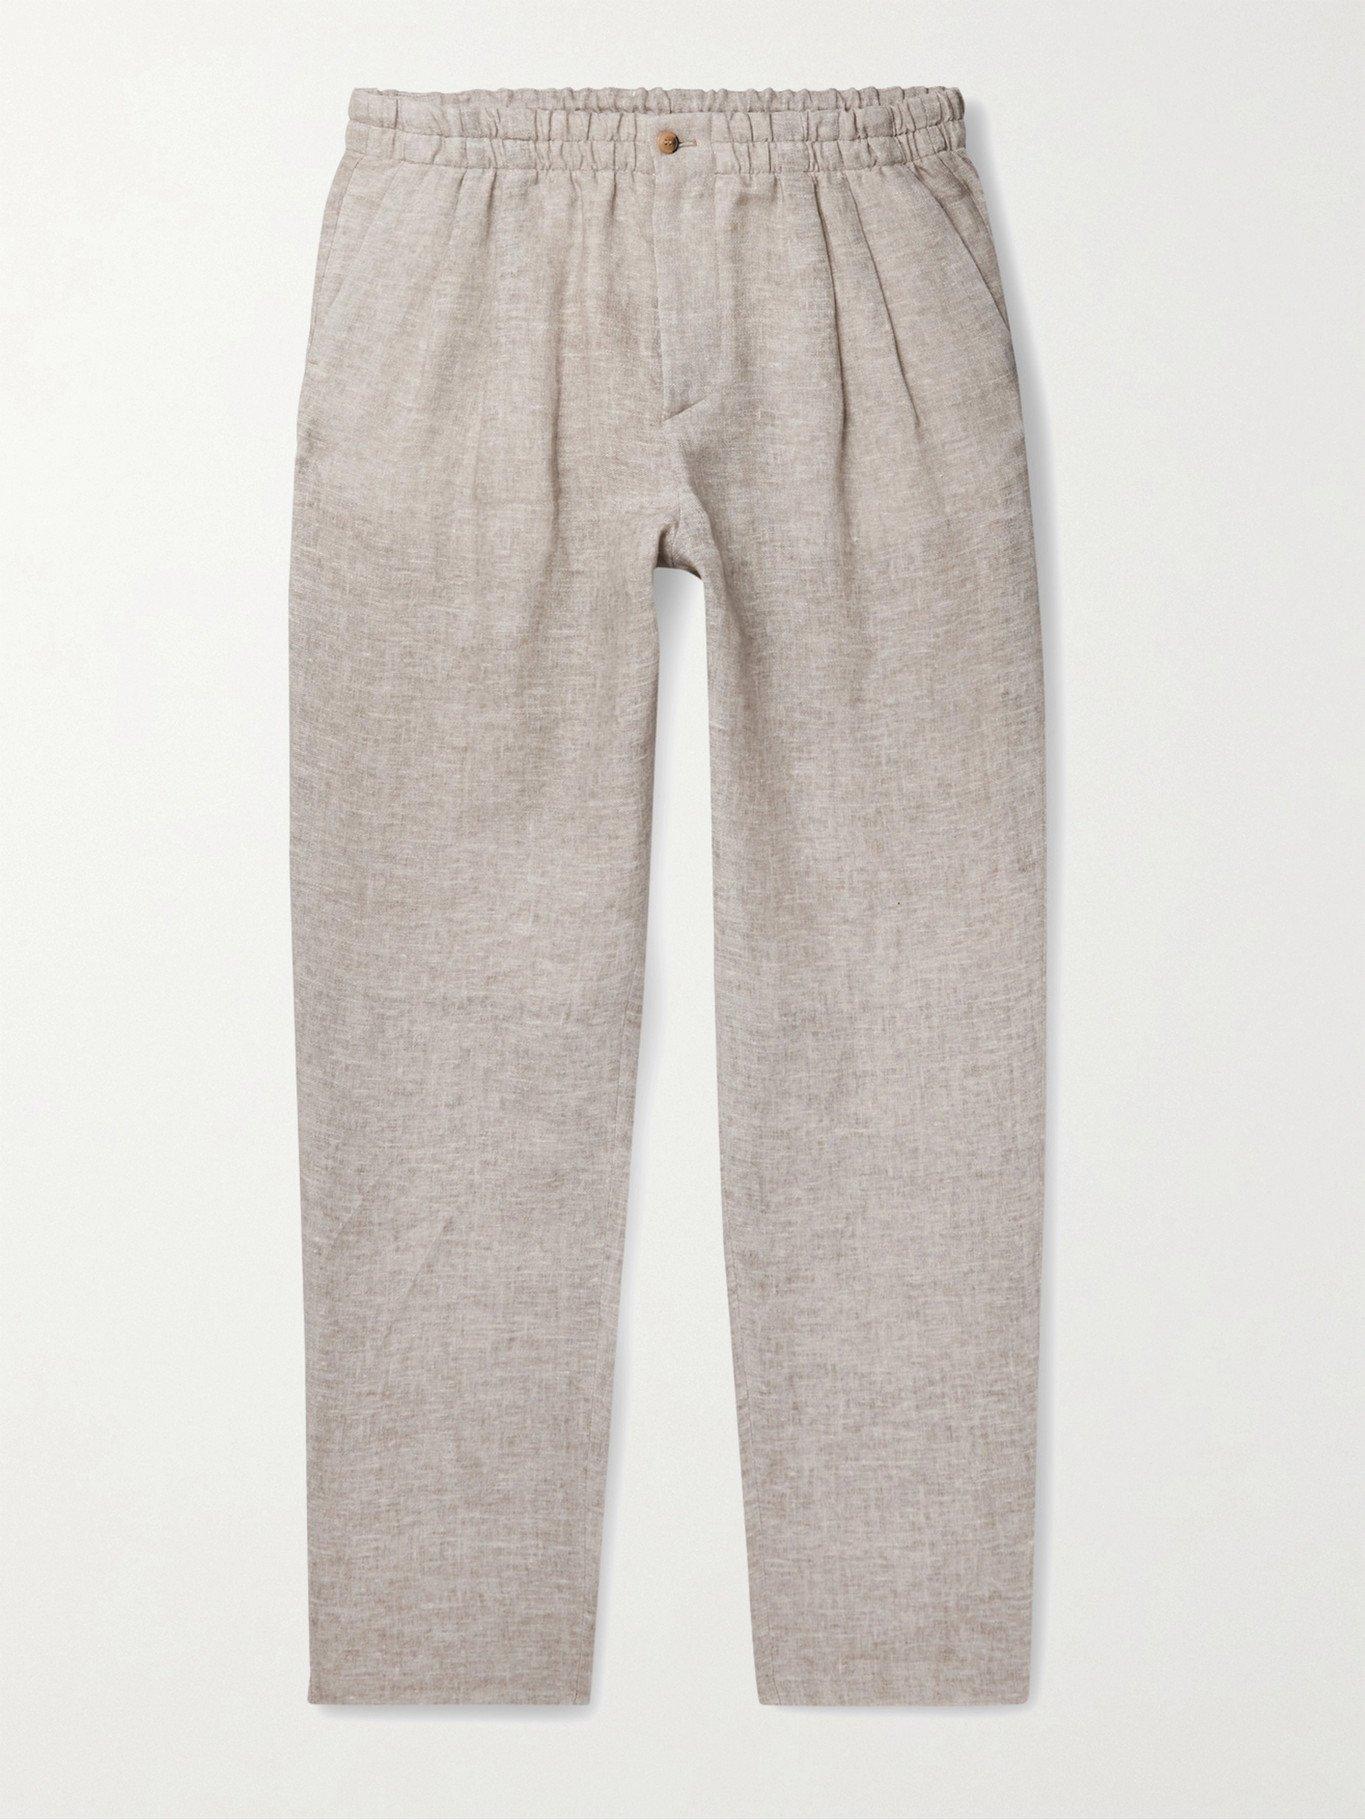 GIORGIO ARMANI - Tapered Linen Suit Trousers - Neutrals